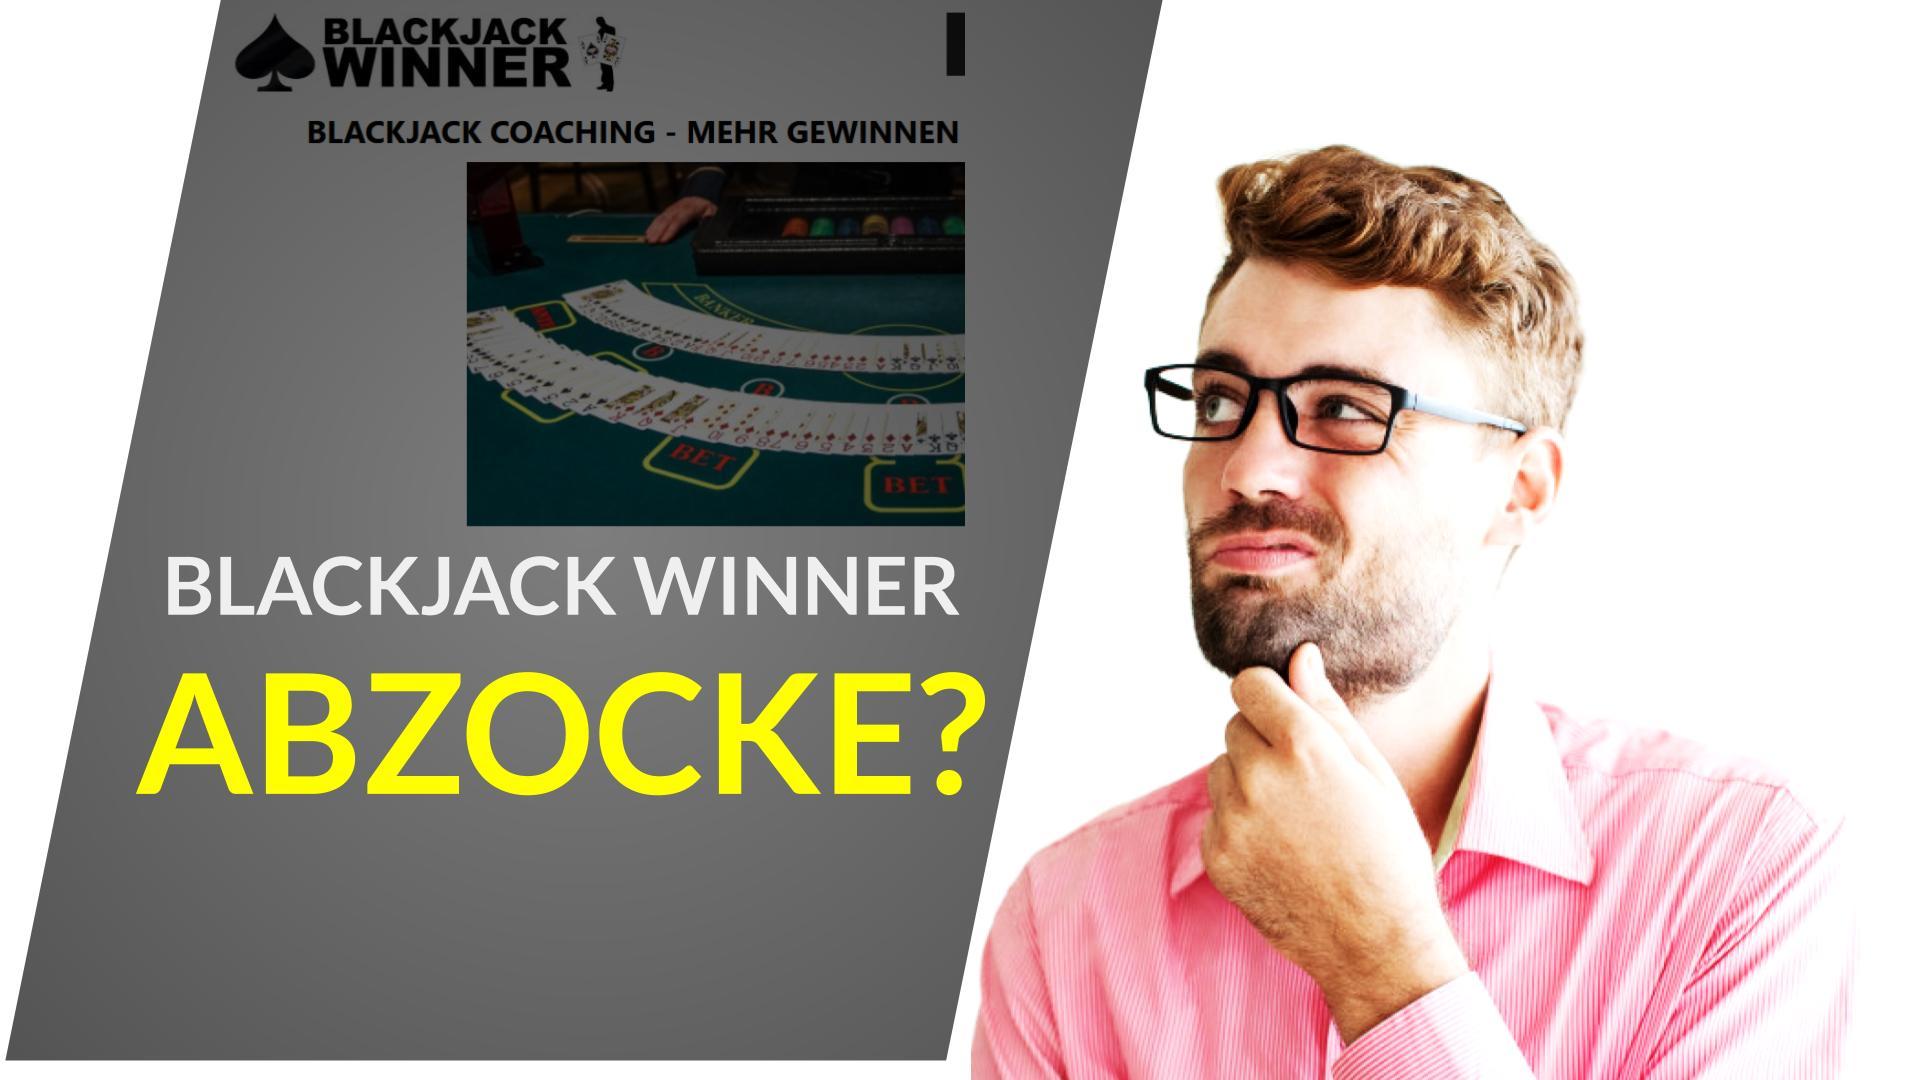 blackjack-winner-keine-abzocke